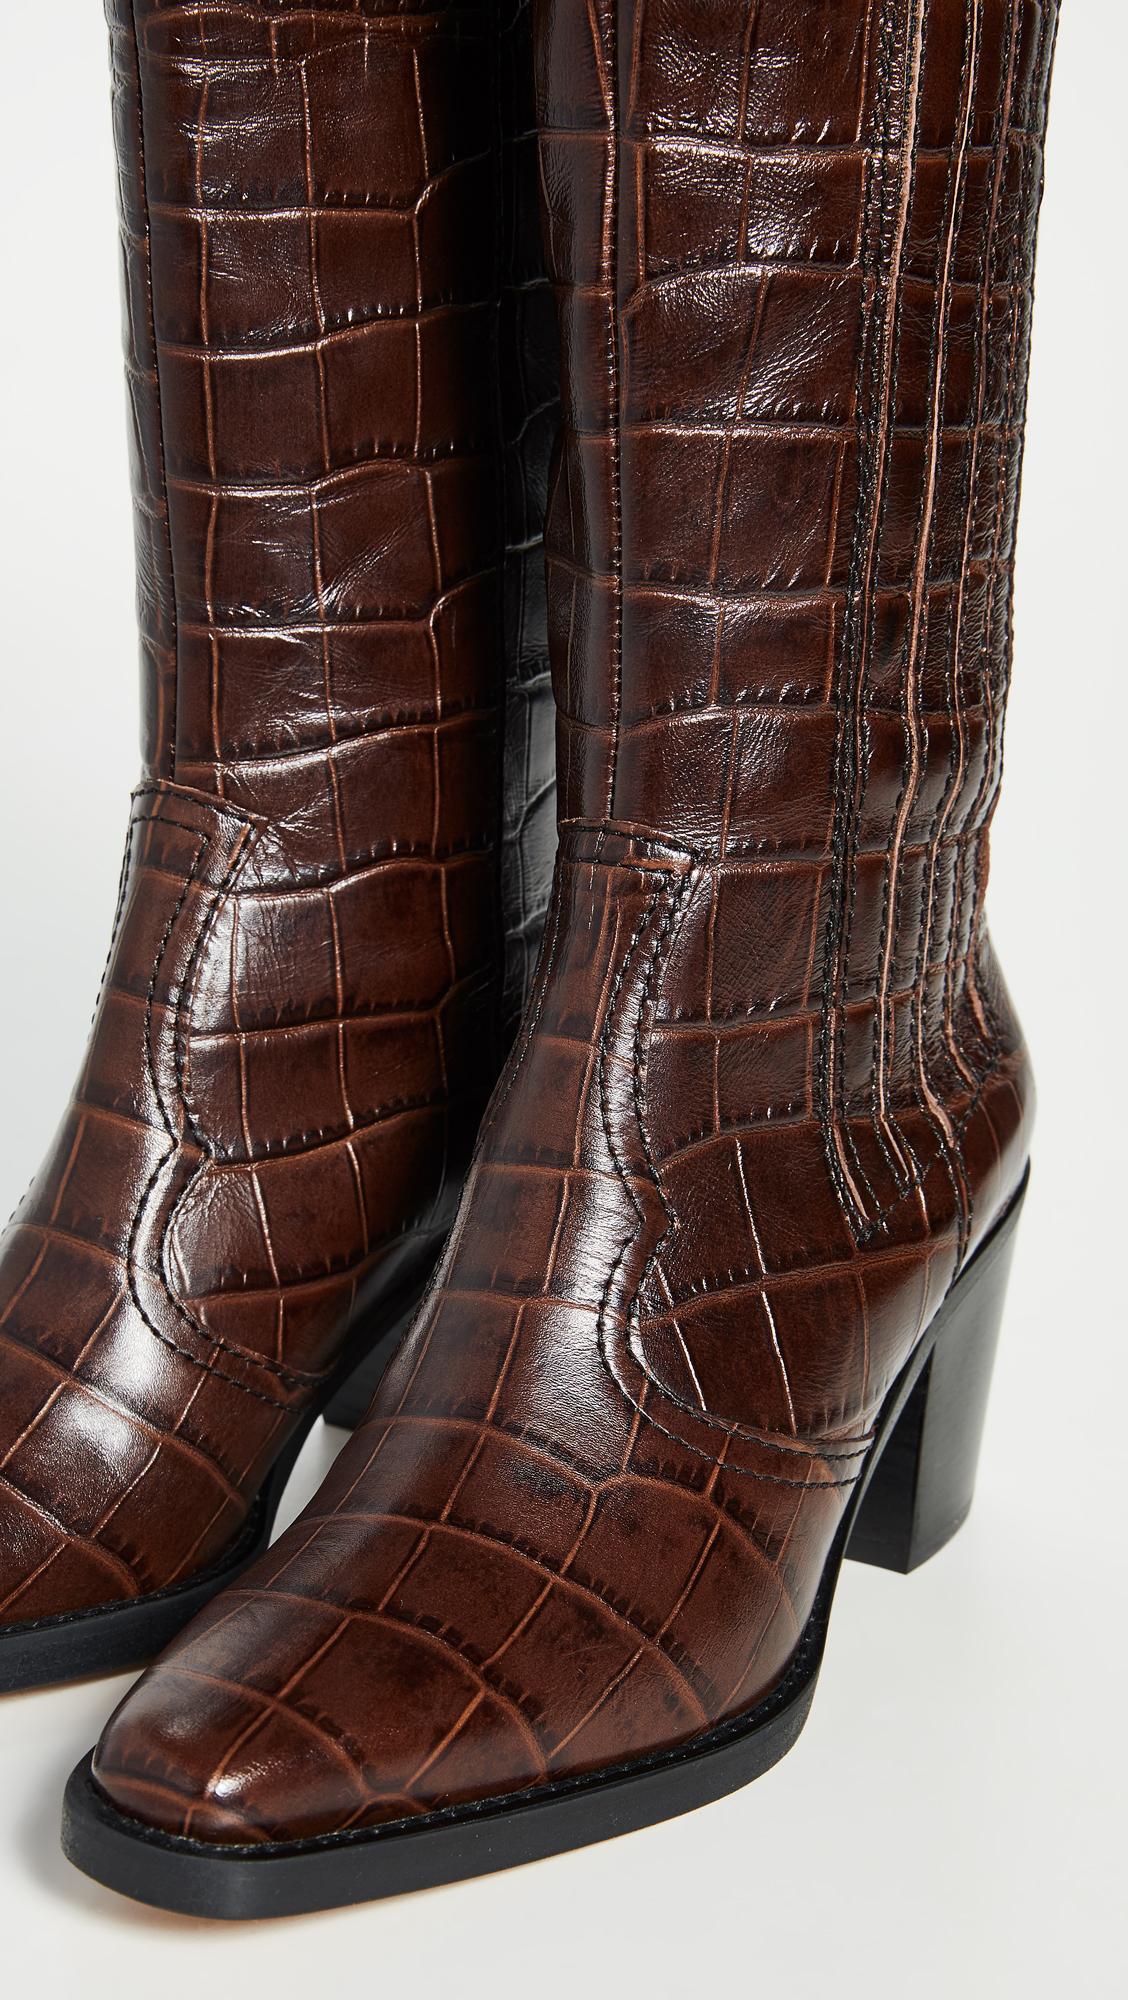 Ganni Western Knee High Boots Shopbop Sale On Sale Save